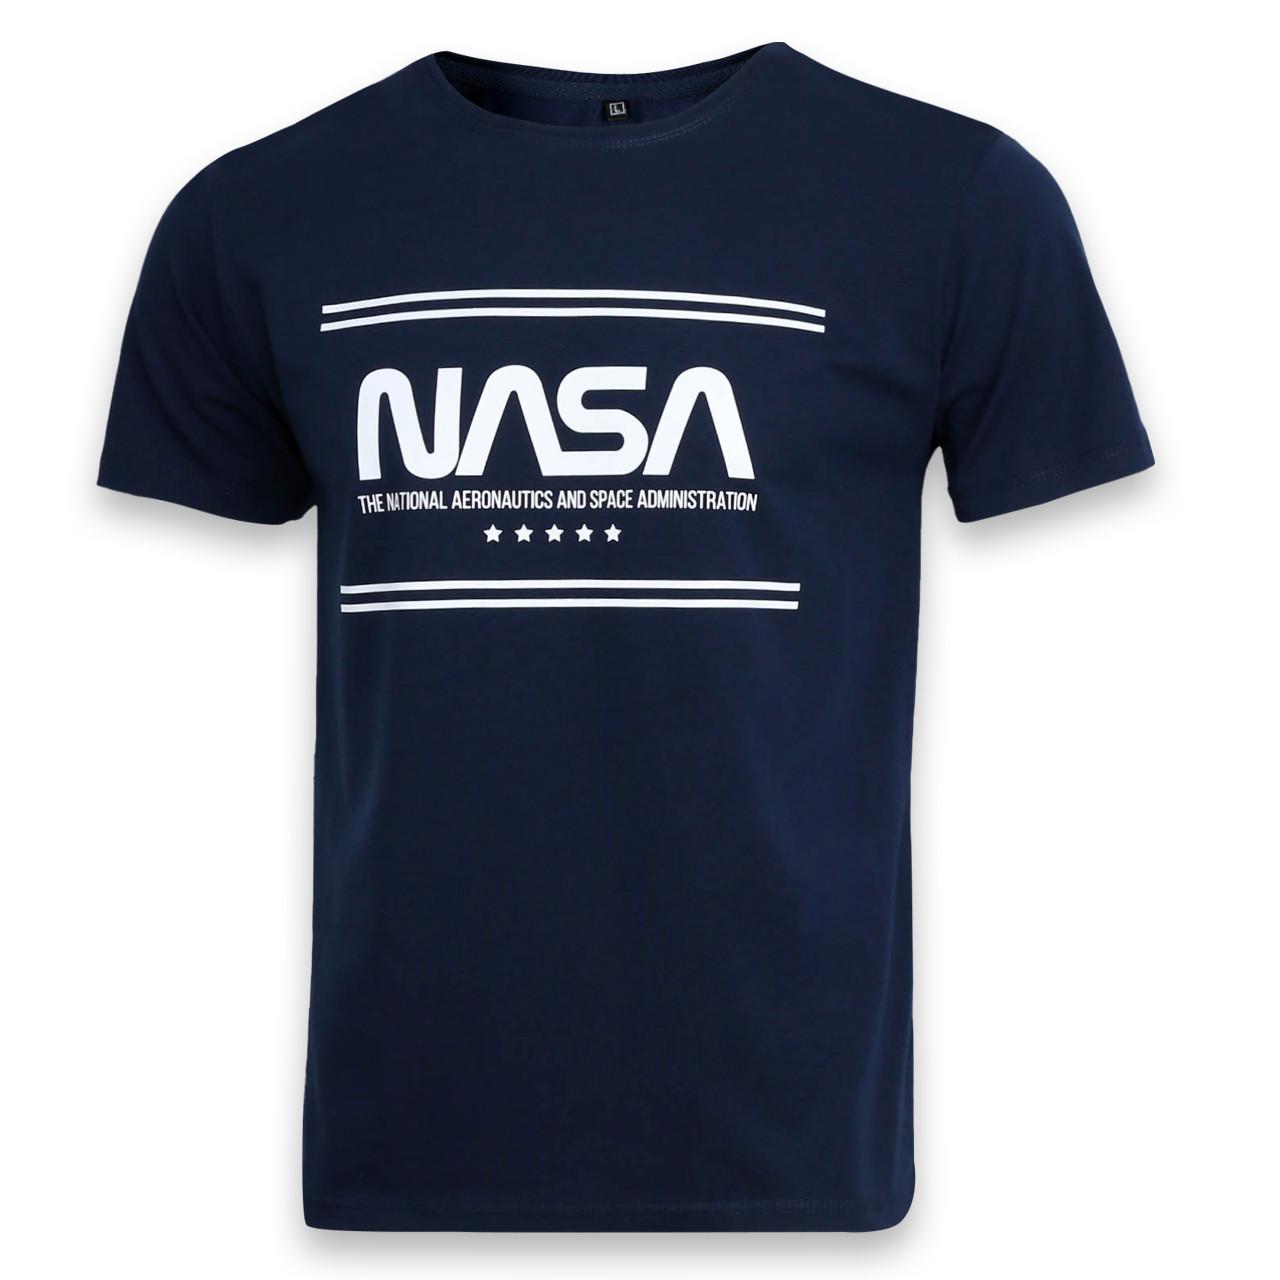 Футболка мужская т синяя с принтом NASA Ф-10 DBLU L(Р) 19-626-020